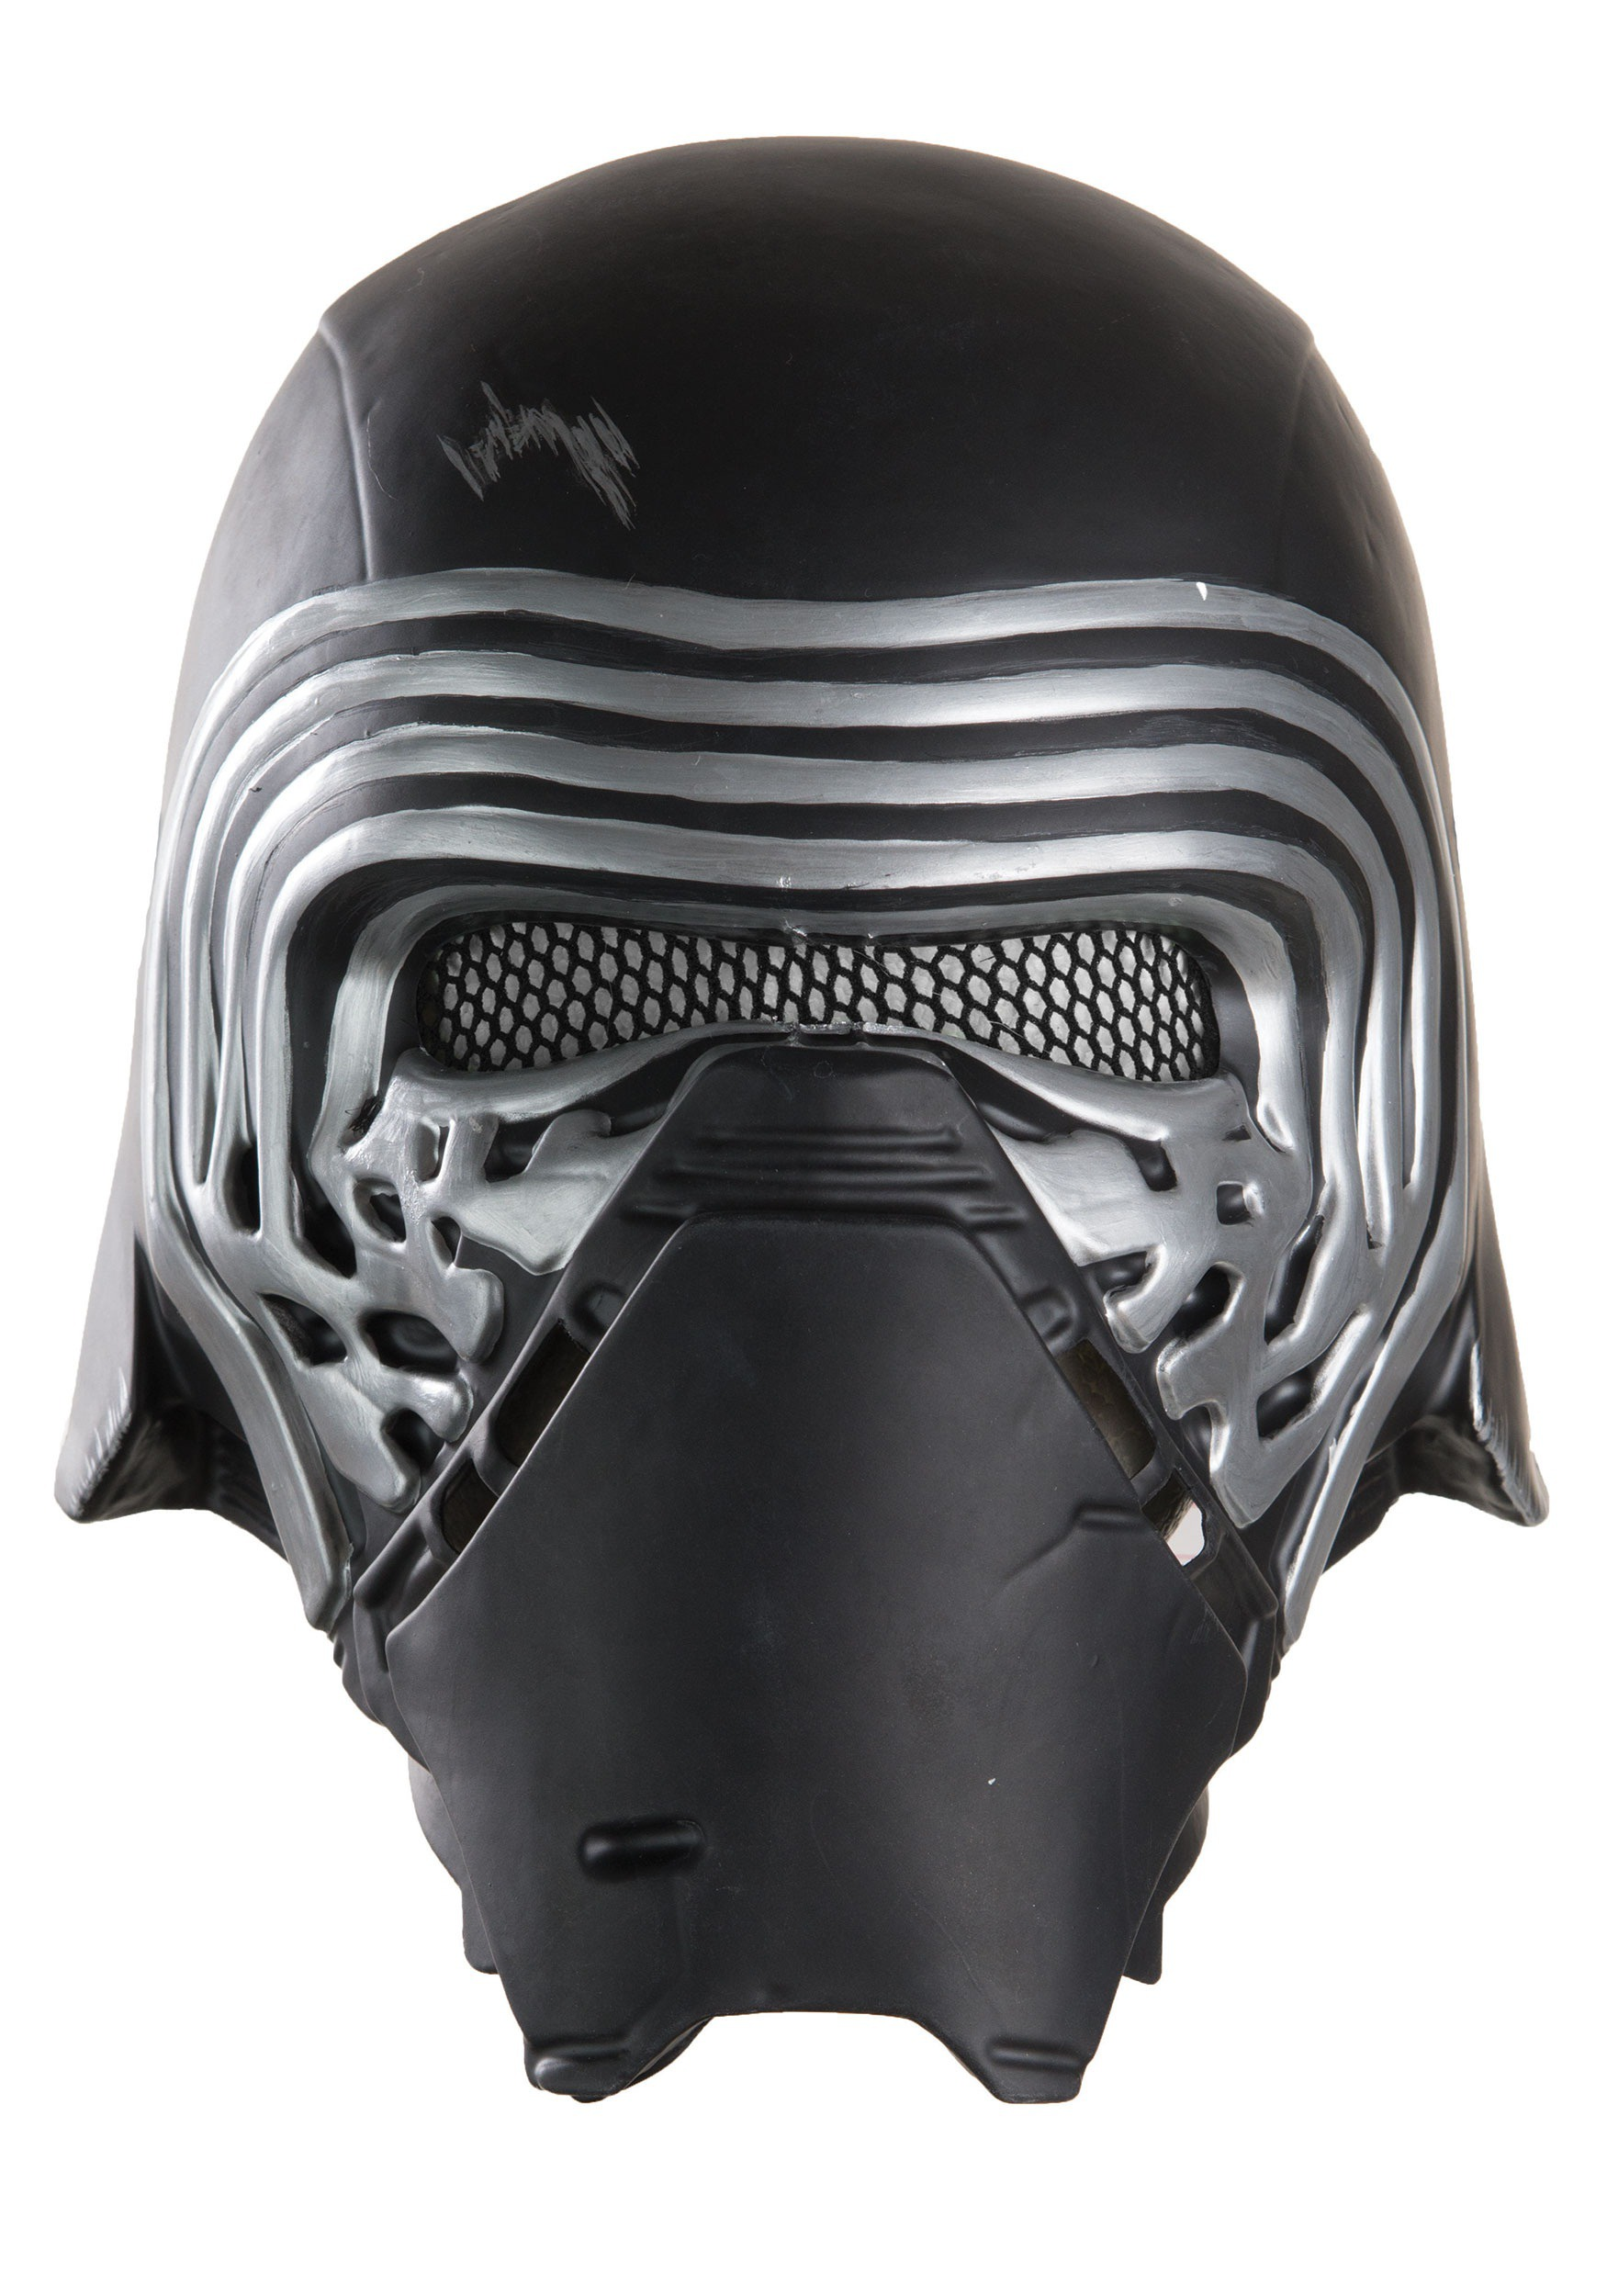 Adult Star Wars The Force Awakens Kylo Ren 1/2 Helmet RU32298